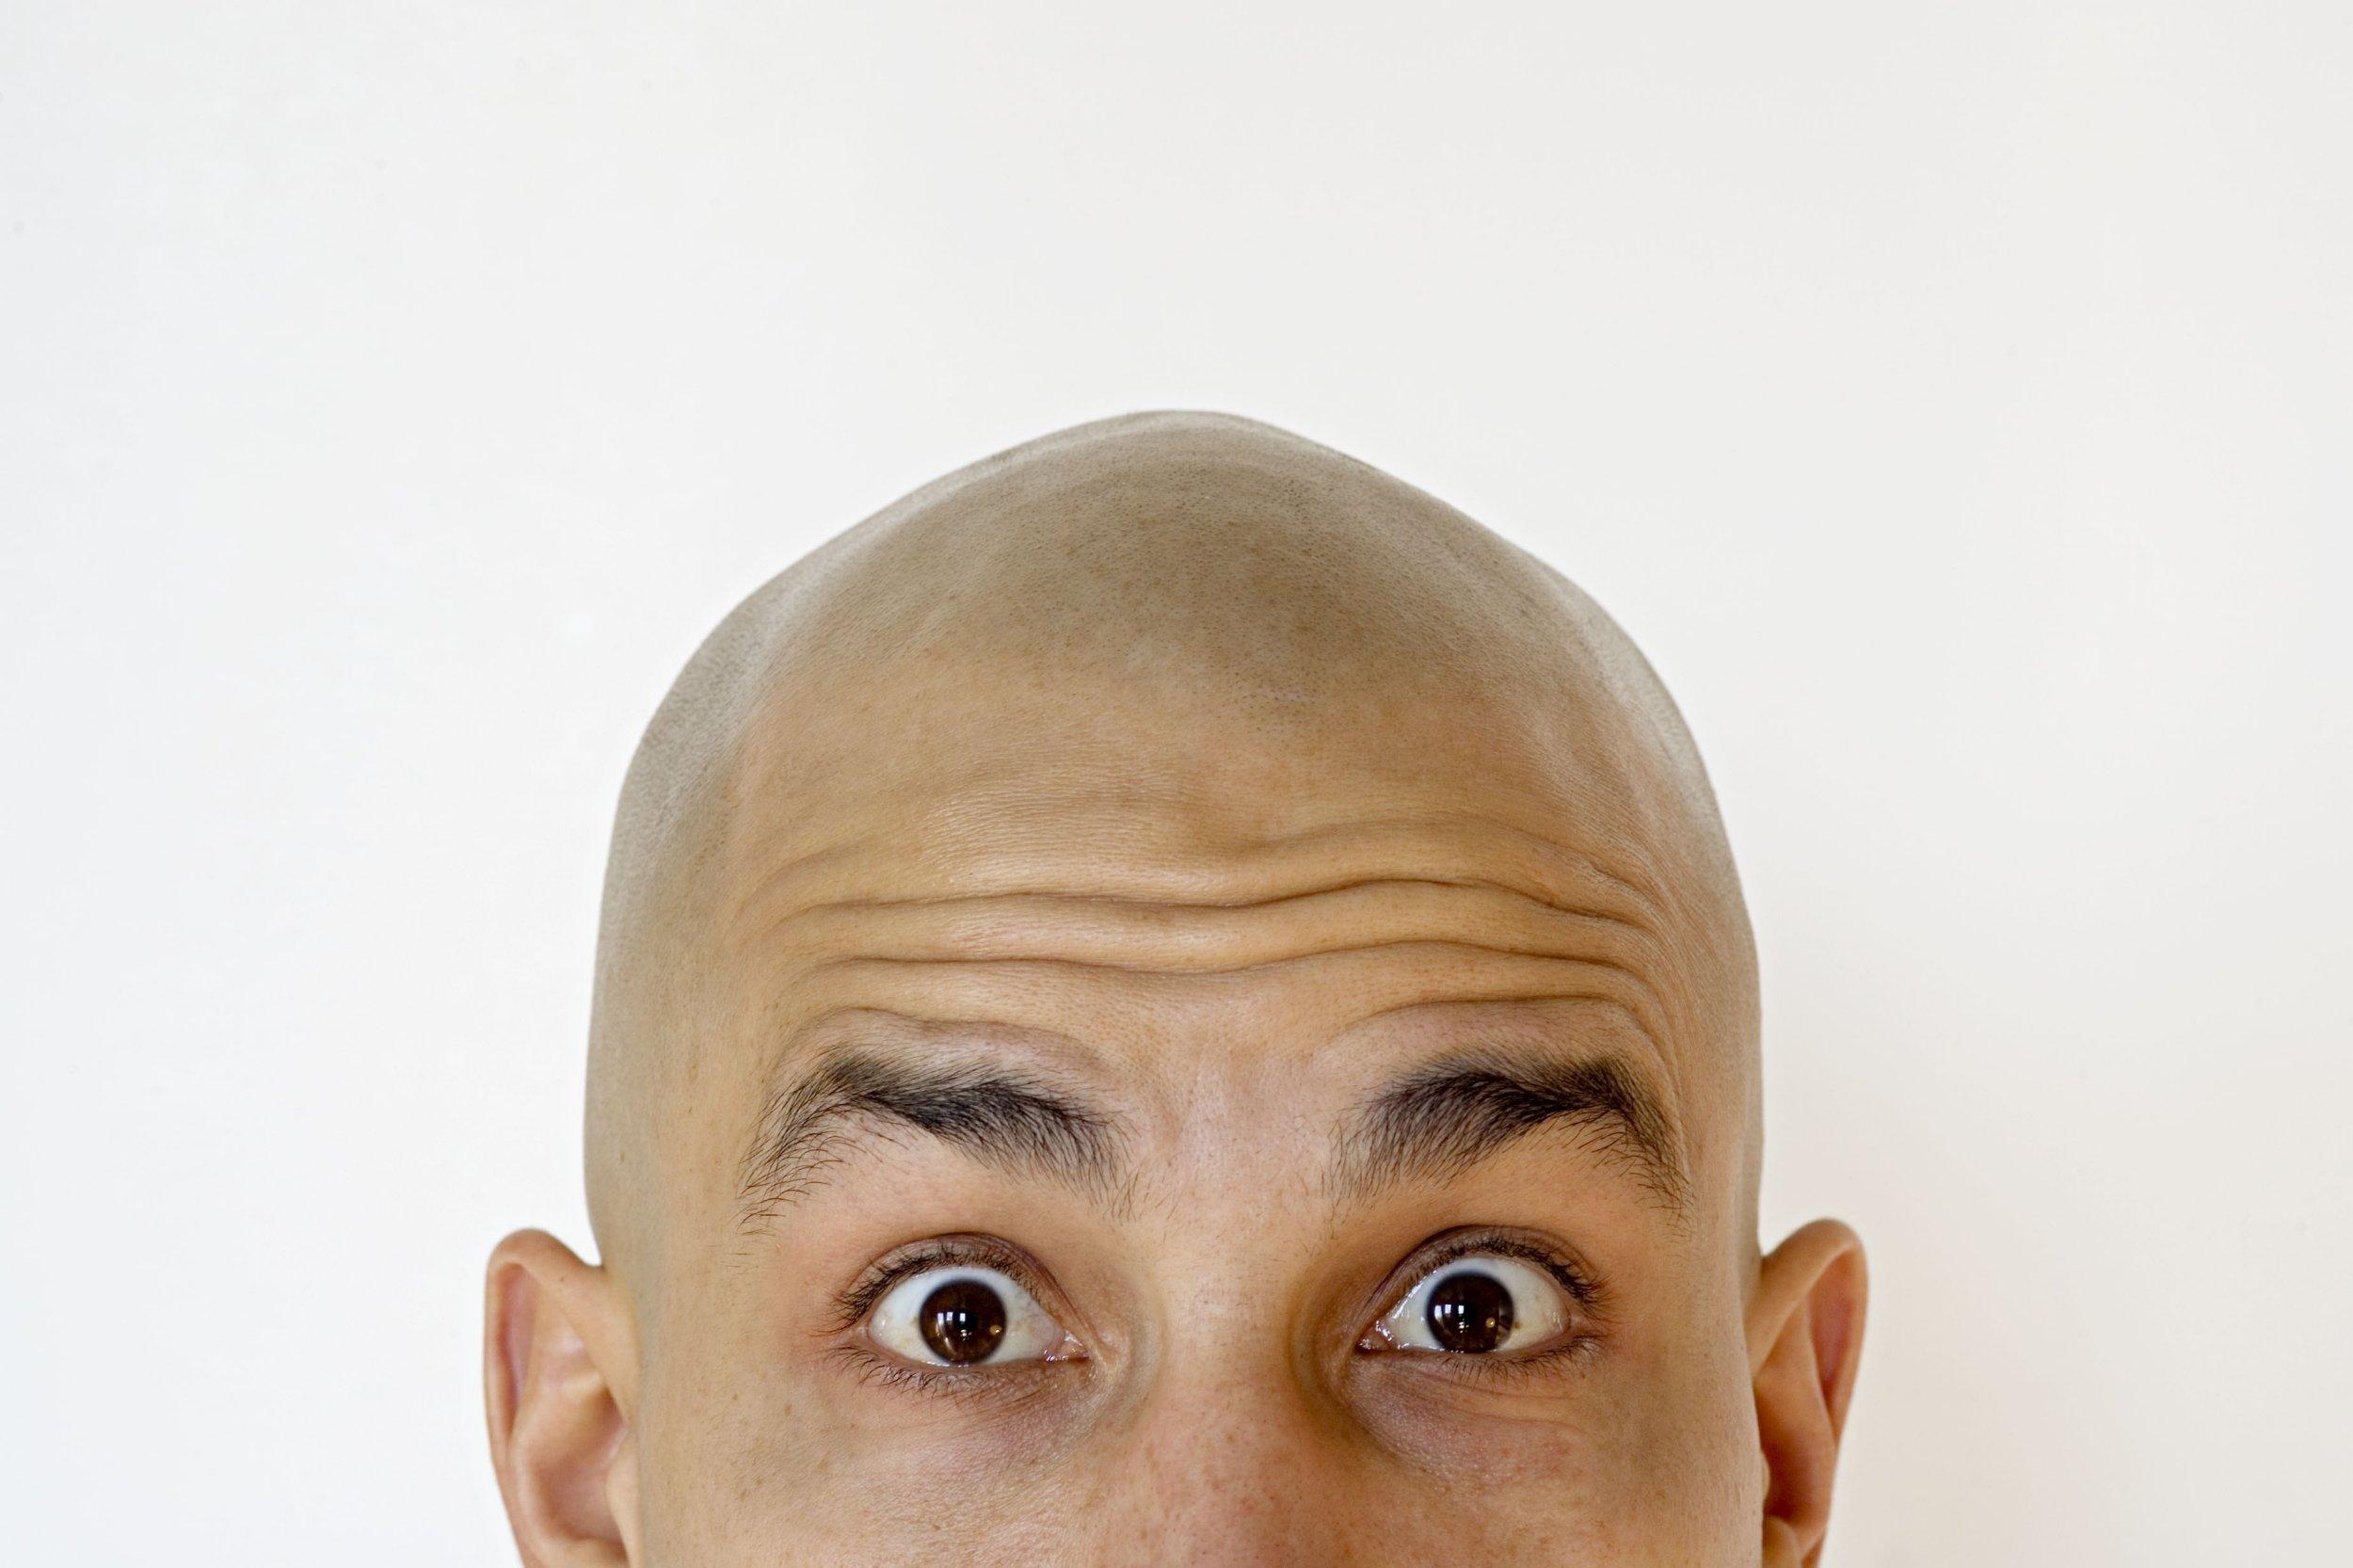 New baldness drug 'makes men regrow their hair' Credit: Getty